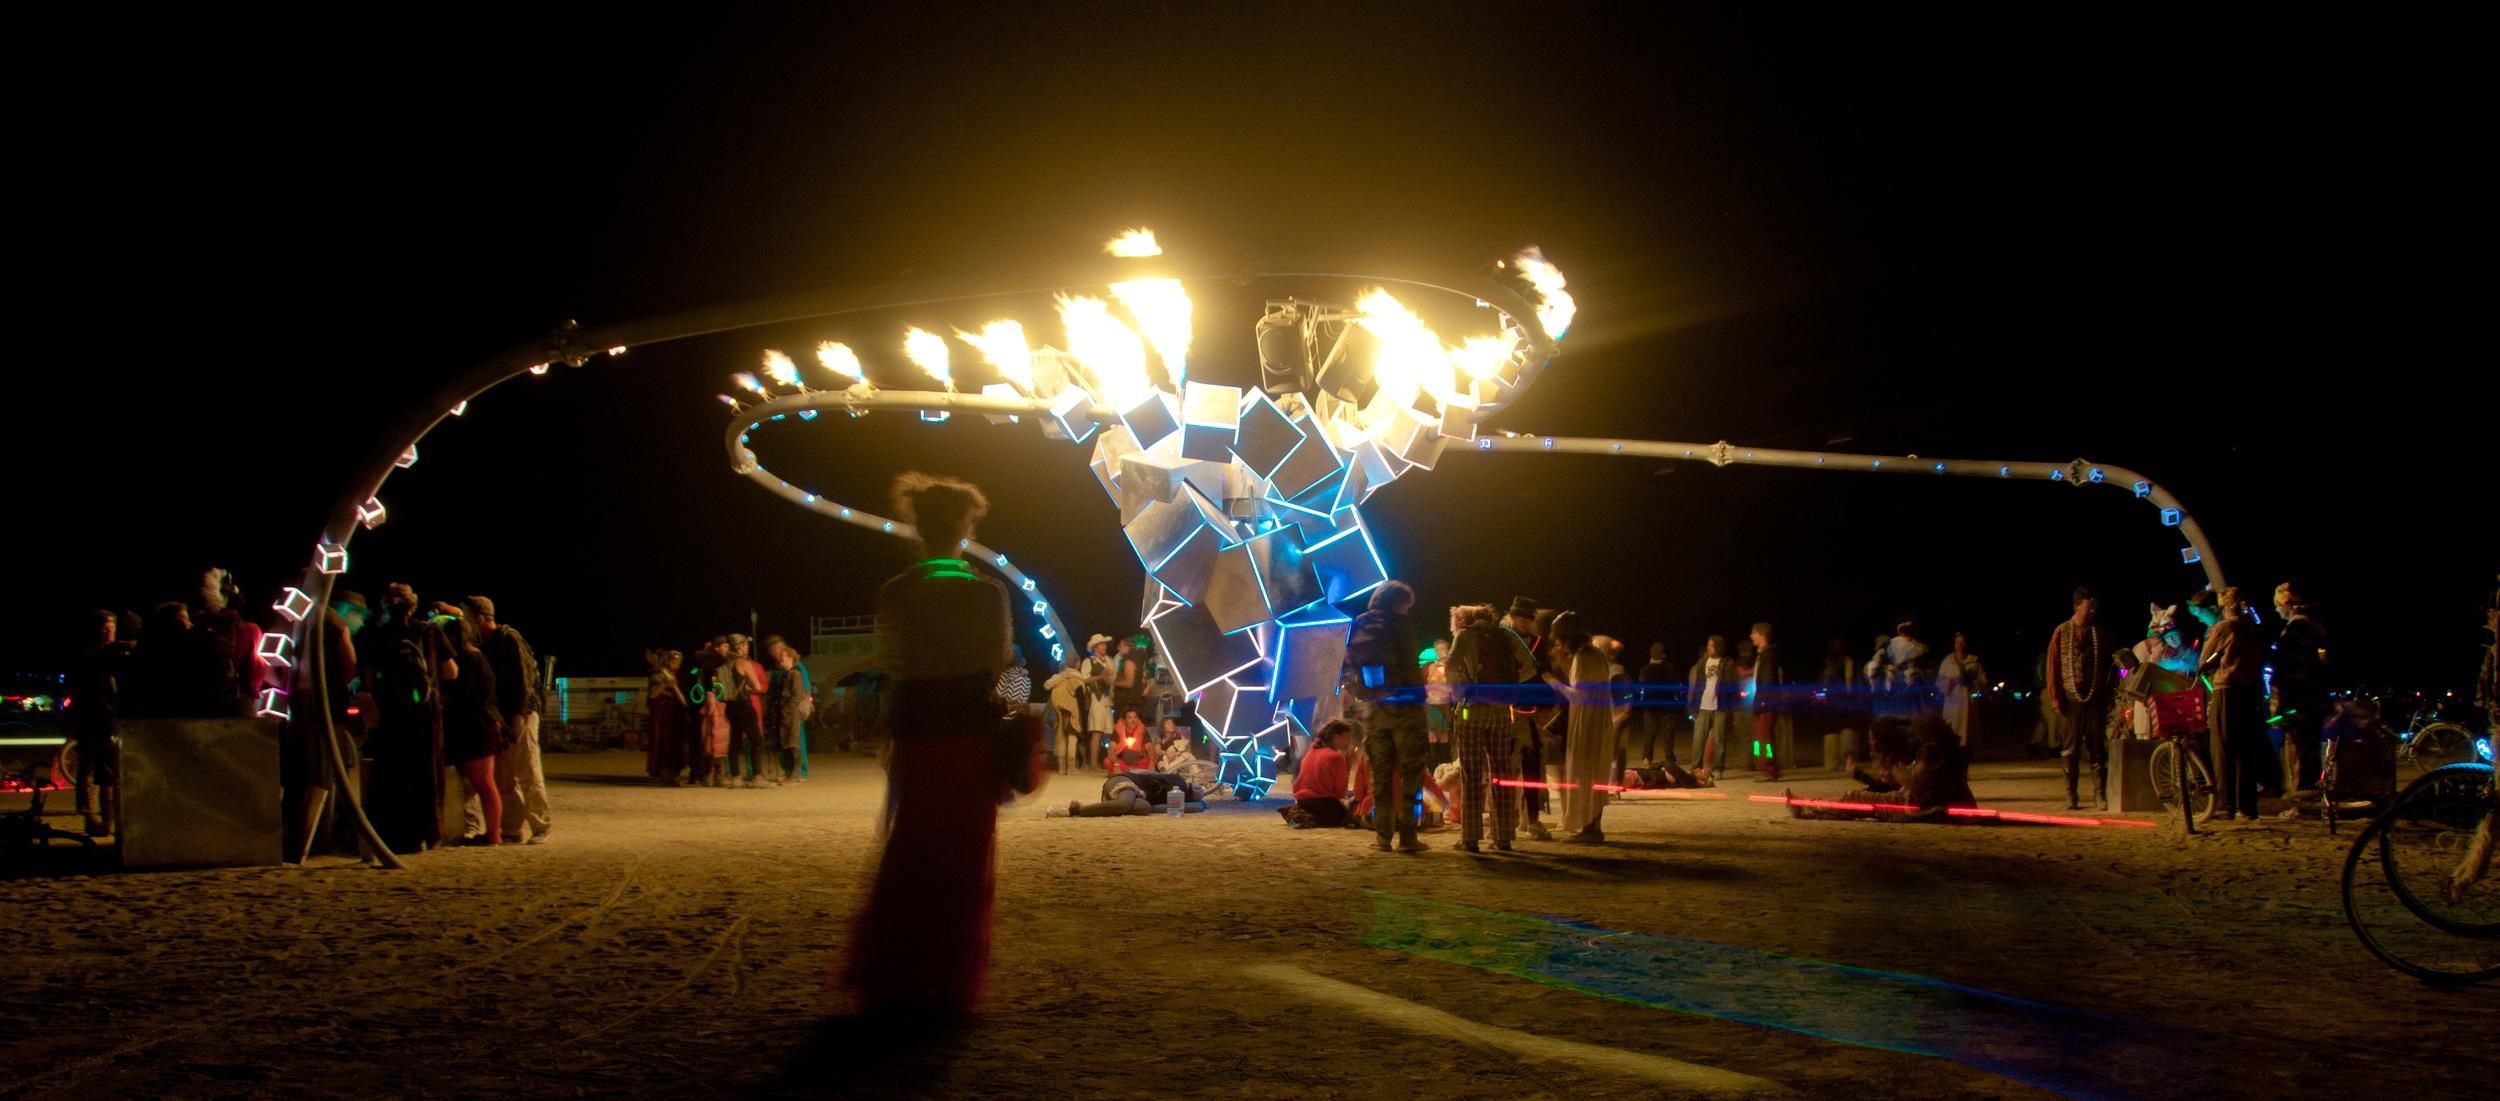 Syzygryd, Burning Man 2010. Photo copyright Michael Broxton,https://www.flickr.com/photos/broxtronix/4981908410.